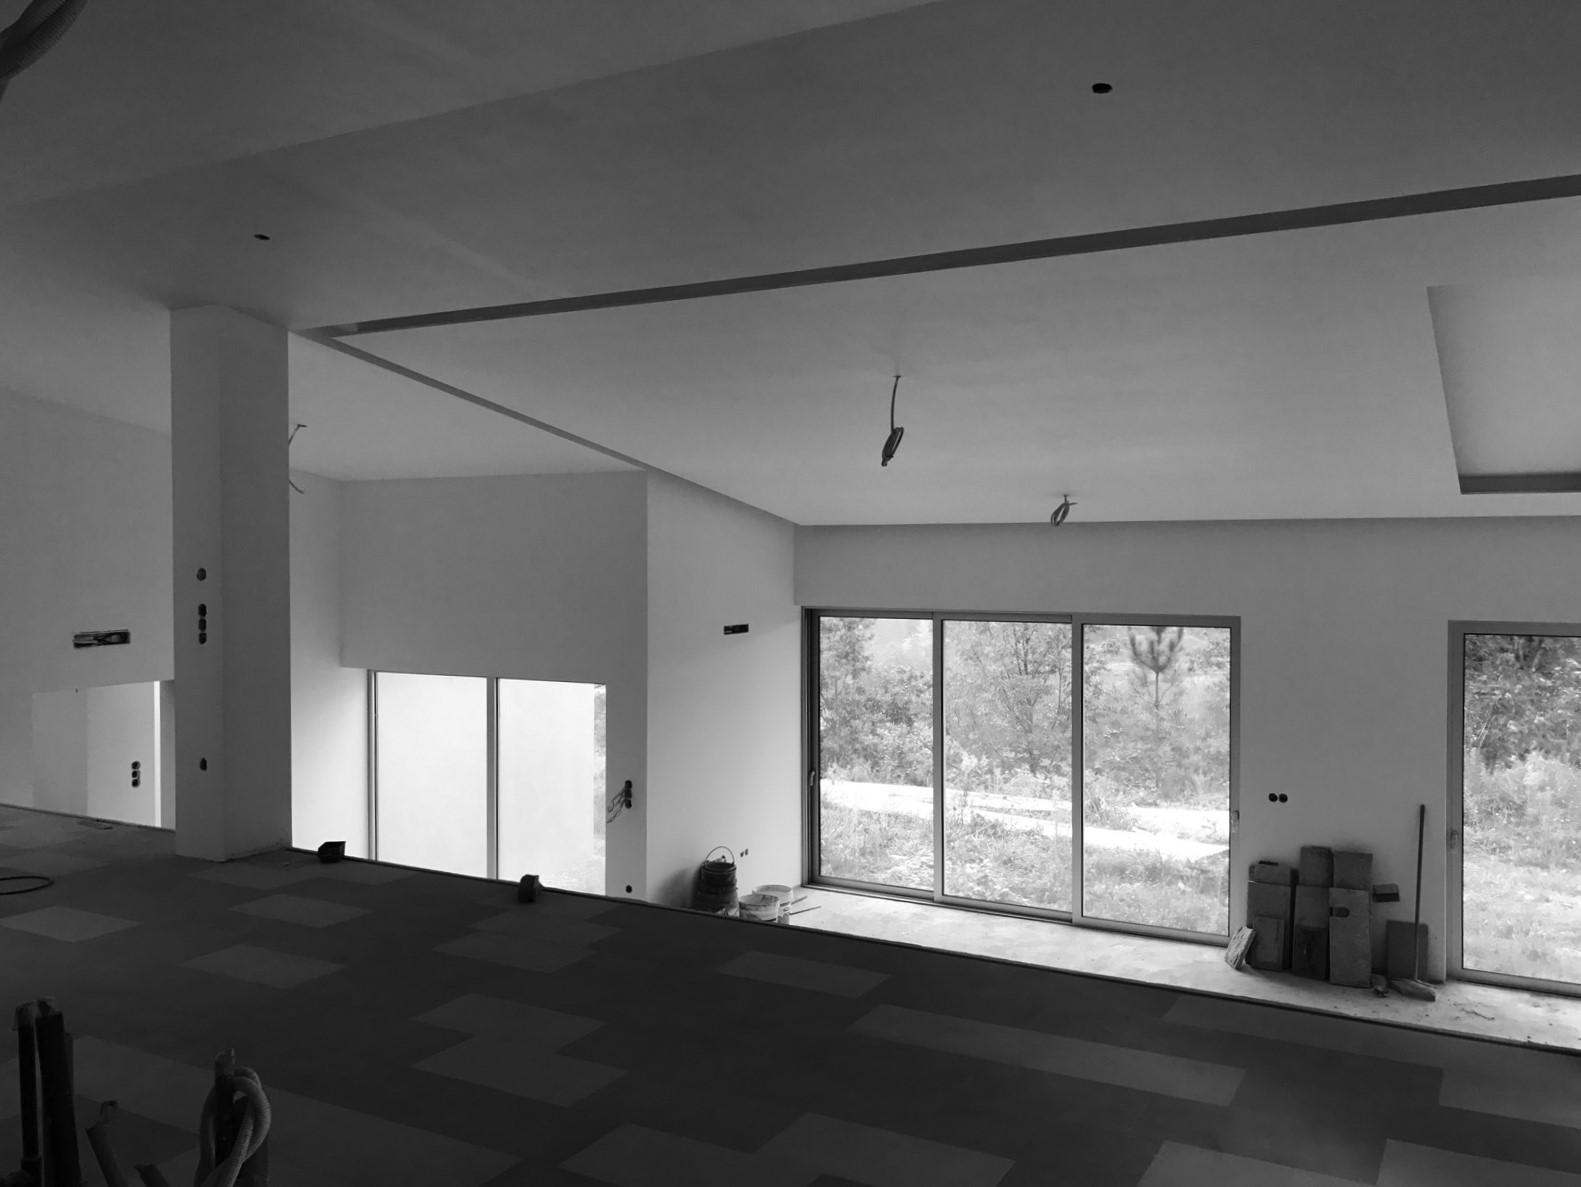 Moradia S+N - arquitectura - EVA evolutionary architecture - arquitectos porto - oliveira de azemeis (40).jpg